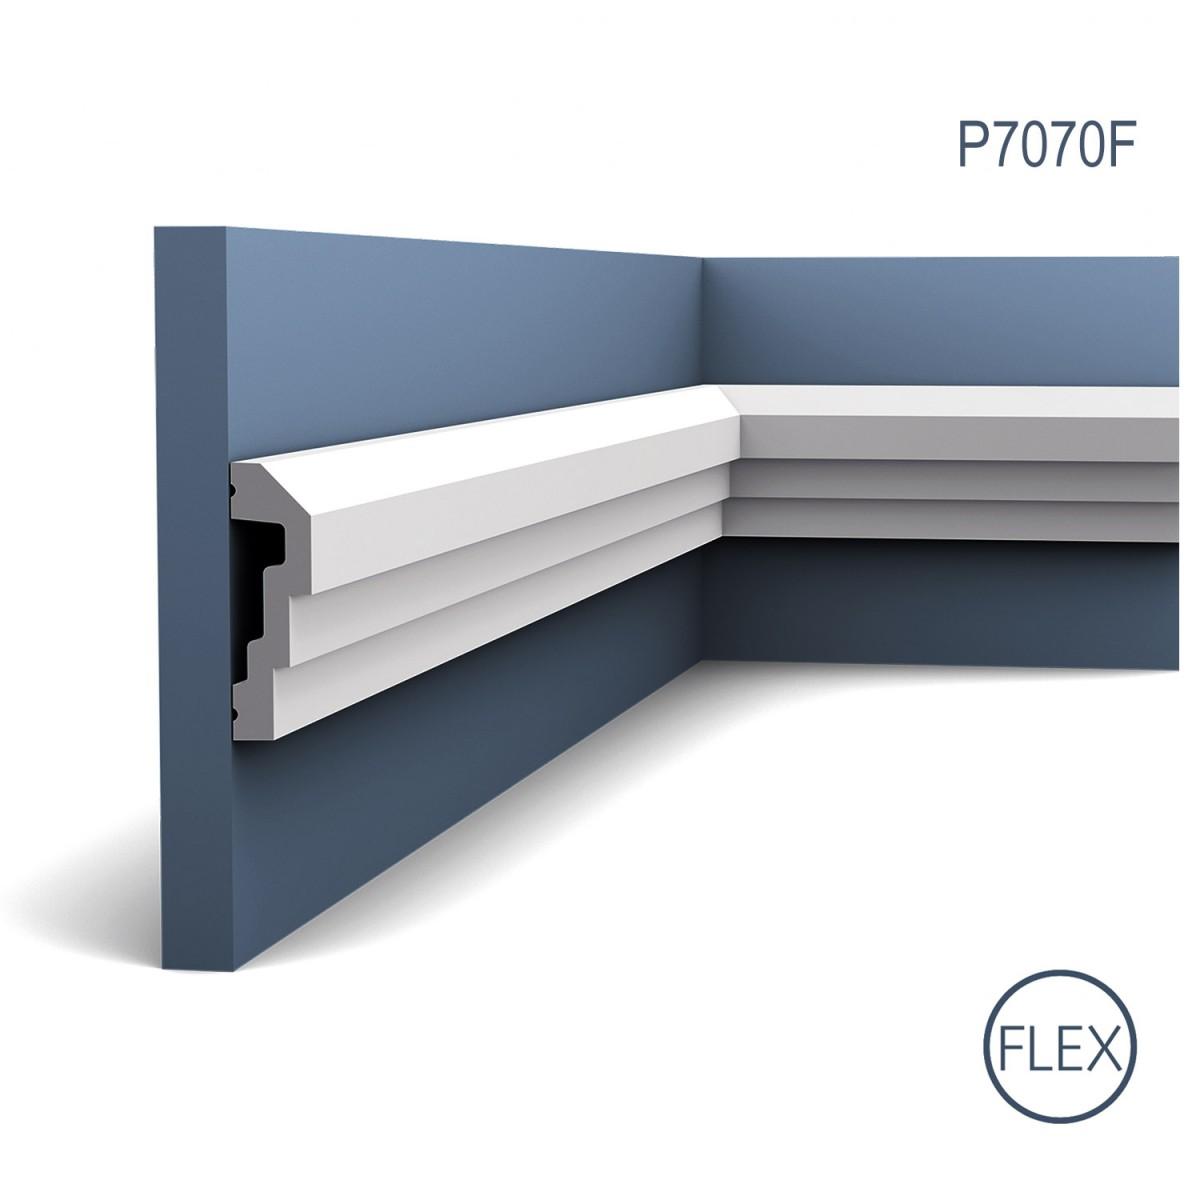 Brau Flex Luxxus P7070F, Dimensiuni: 200 X 7.4 X 2.2 cm, Orac Decor